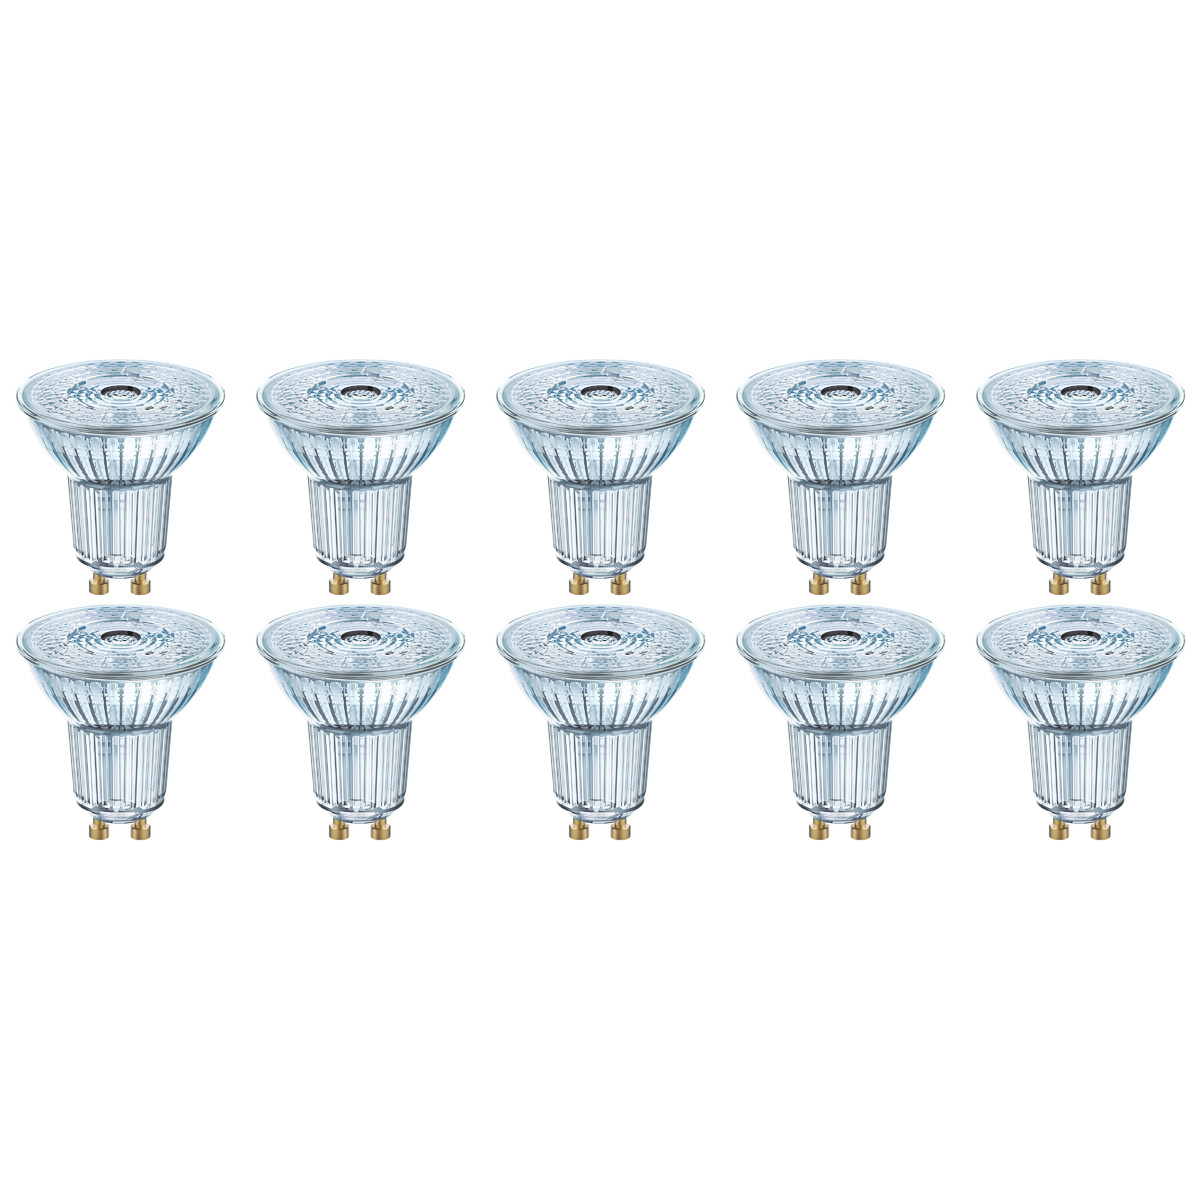 OSRAM - LED Spot 10 Pack - Parathom PAR16 940 36D - GU10 Fitting - Dimbaar - 3.7W - Natuurlijk Wit 4